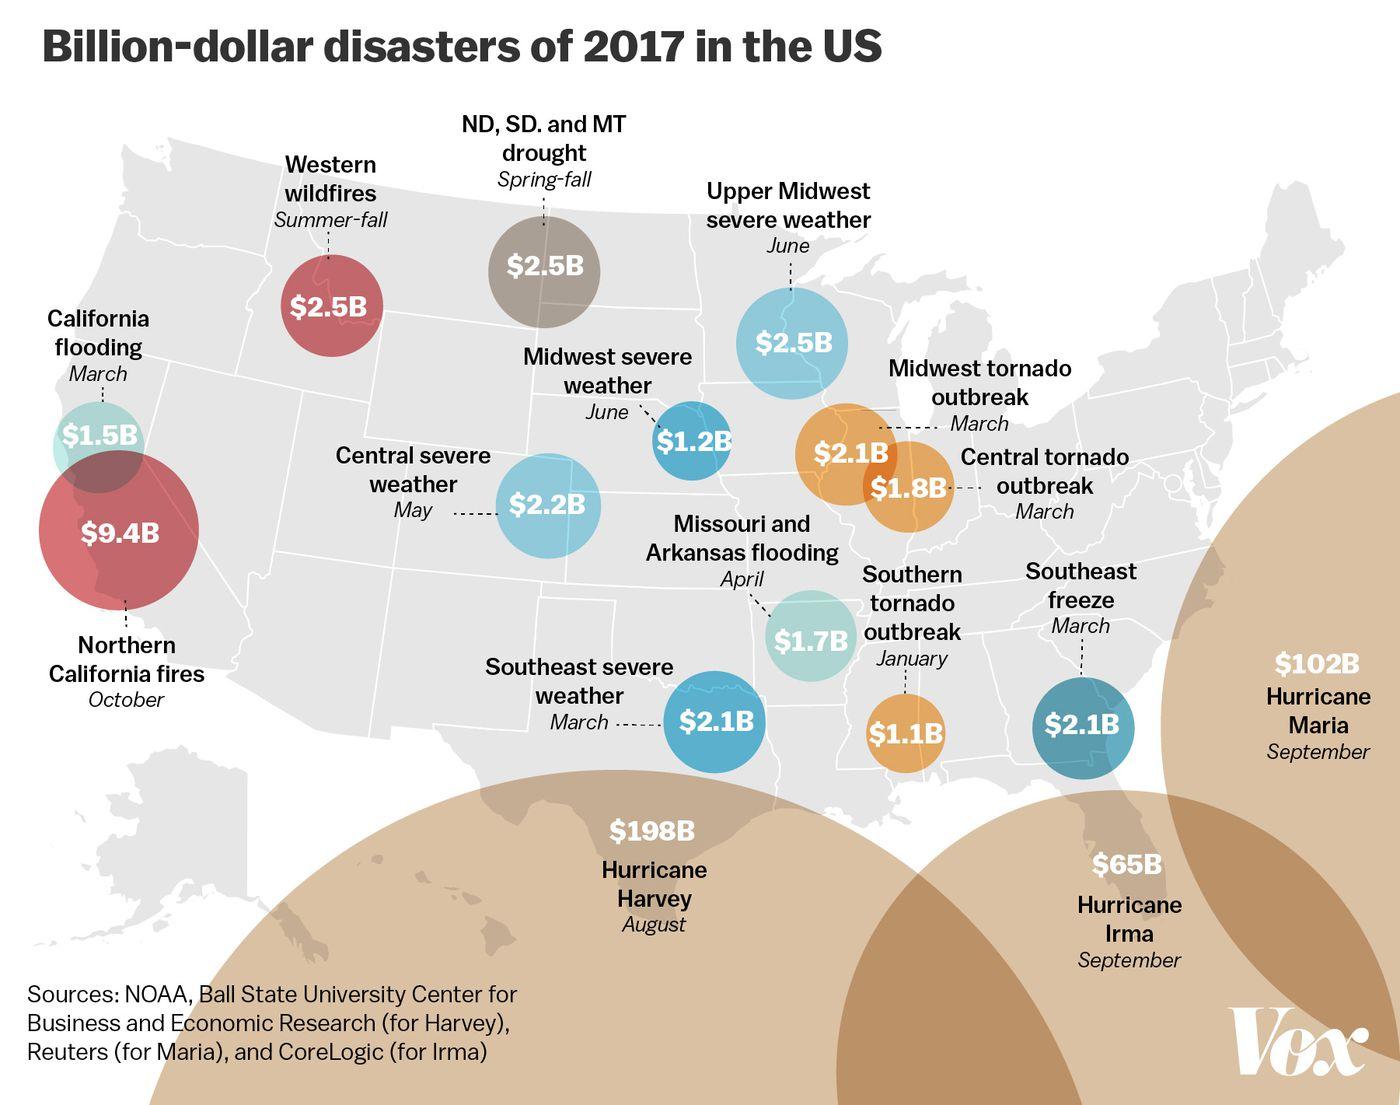 Disasters 2017: The devastating hurricanes, fires, floods